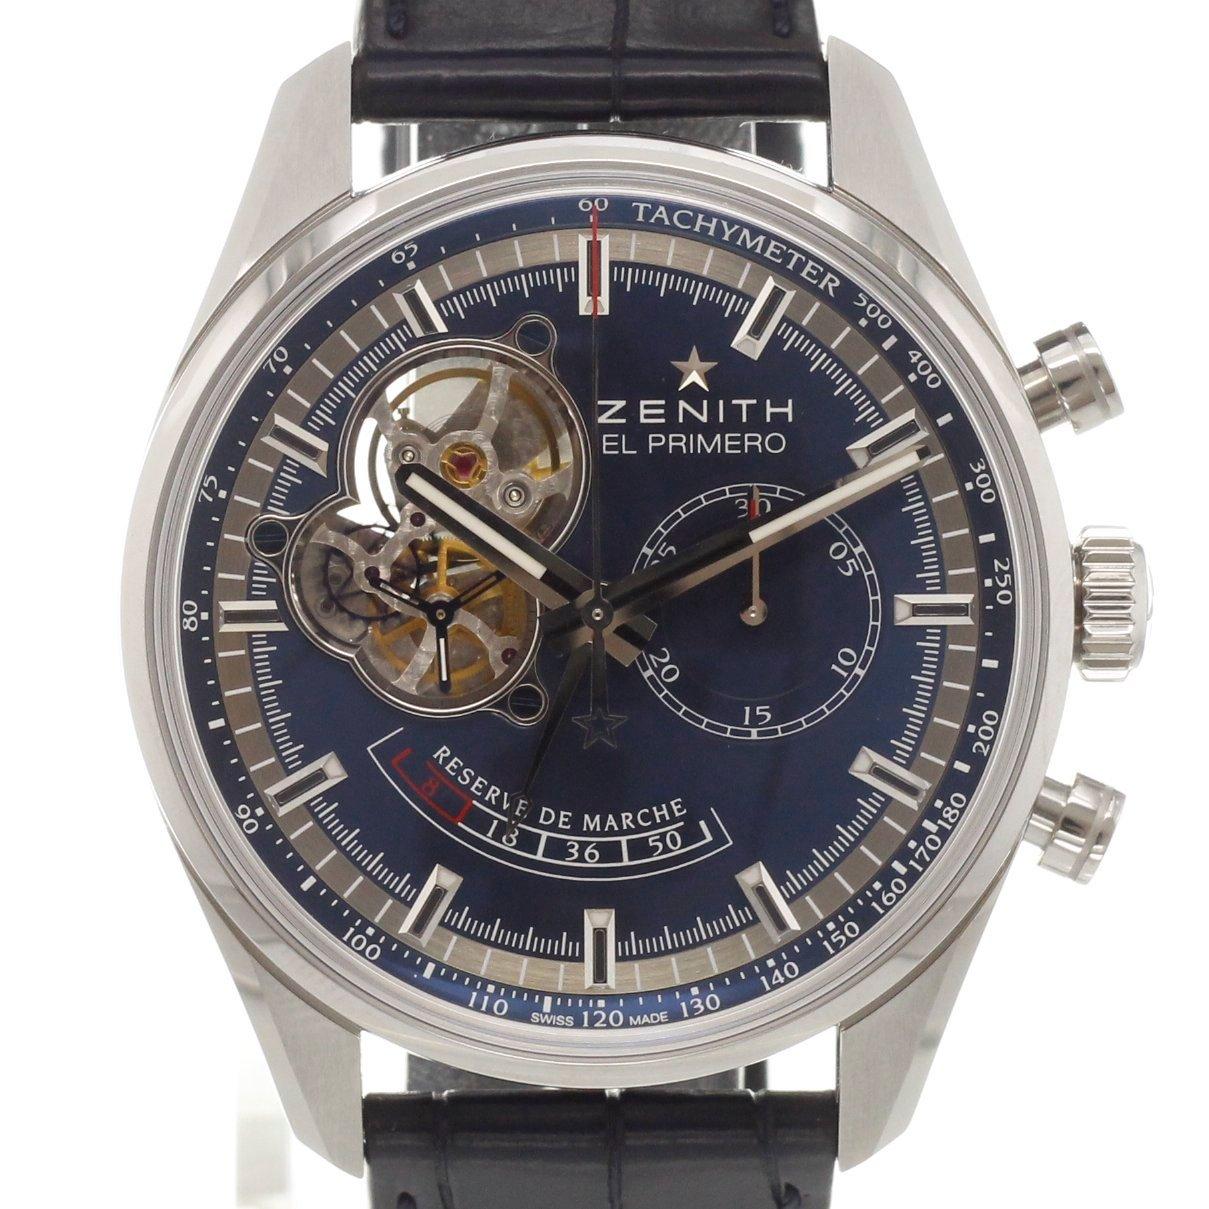 Zenith El Primero Chronomaster Ltd  03 2085 4021/51 C700